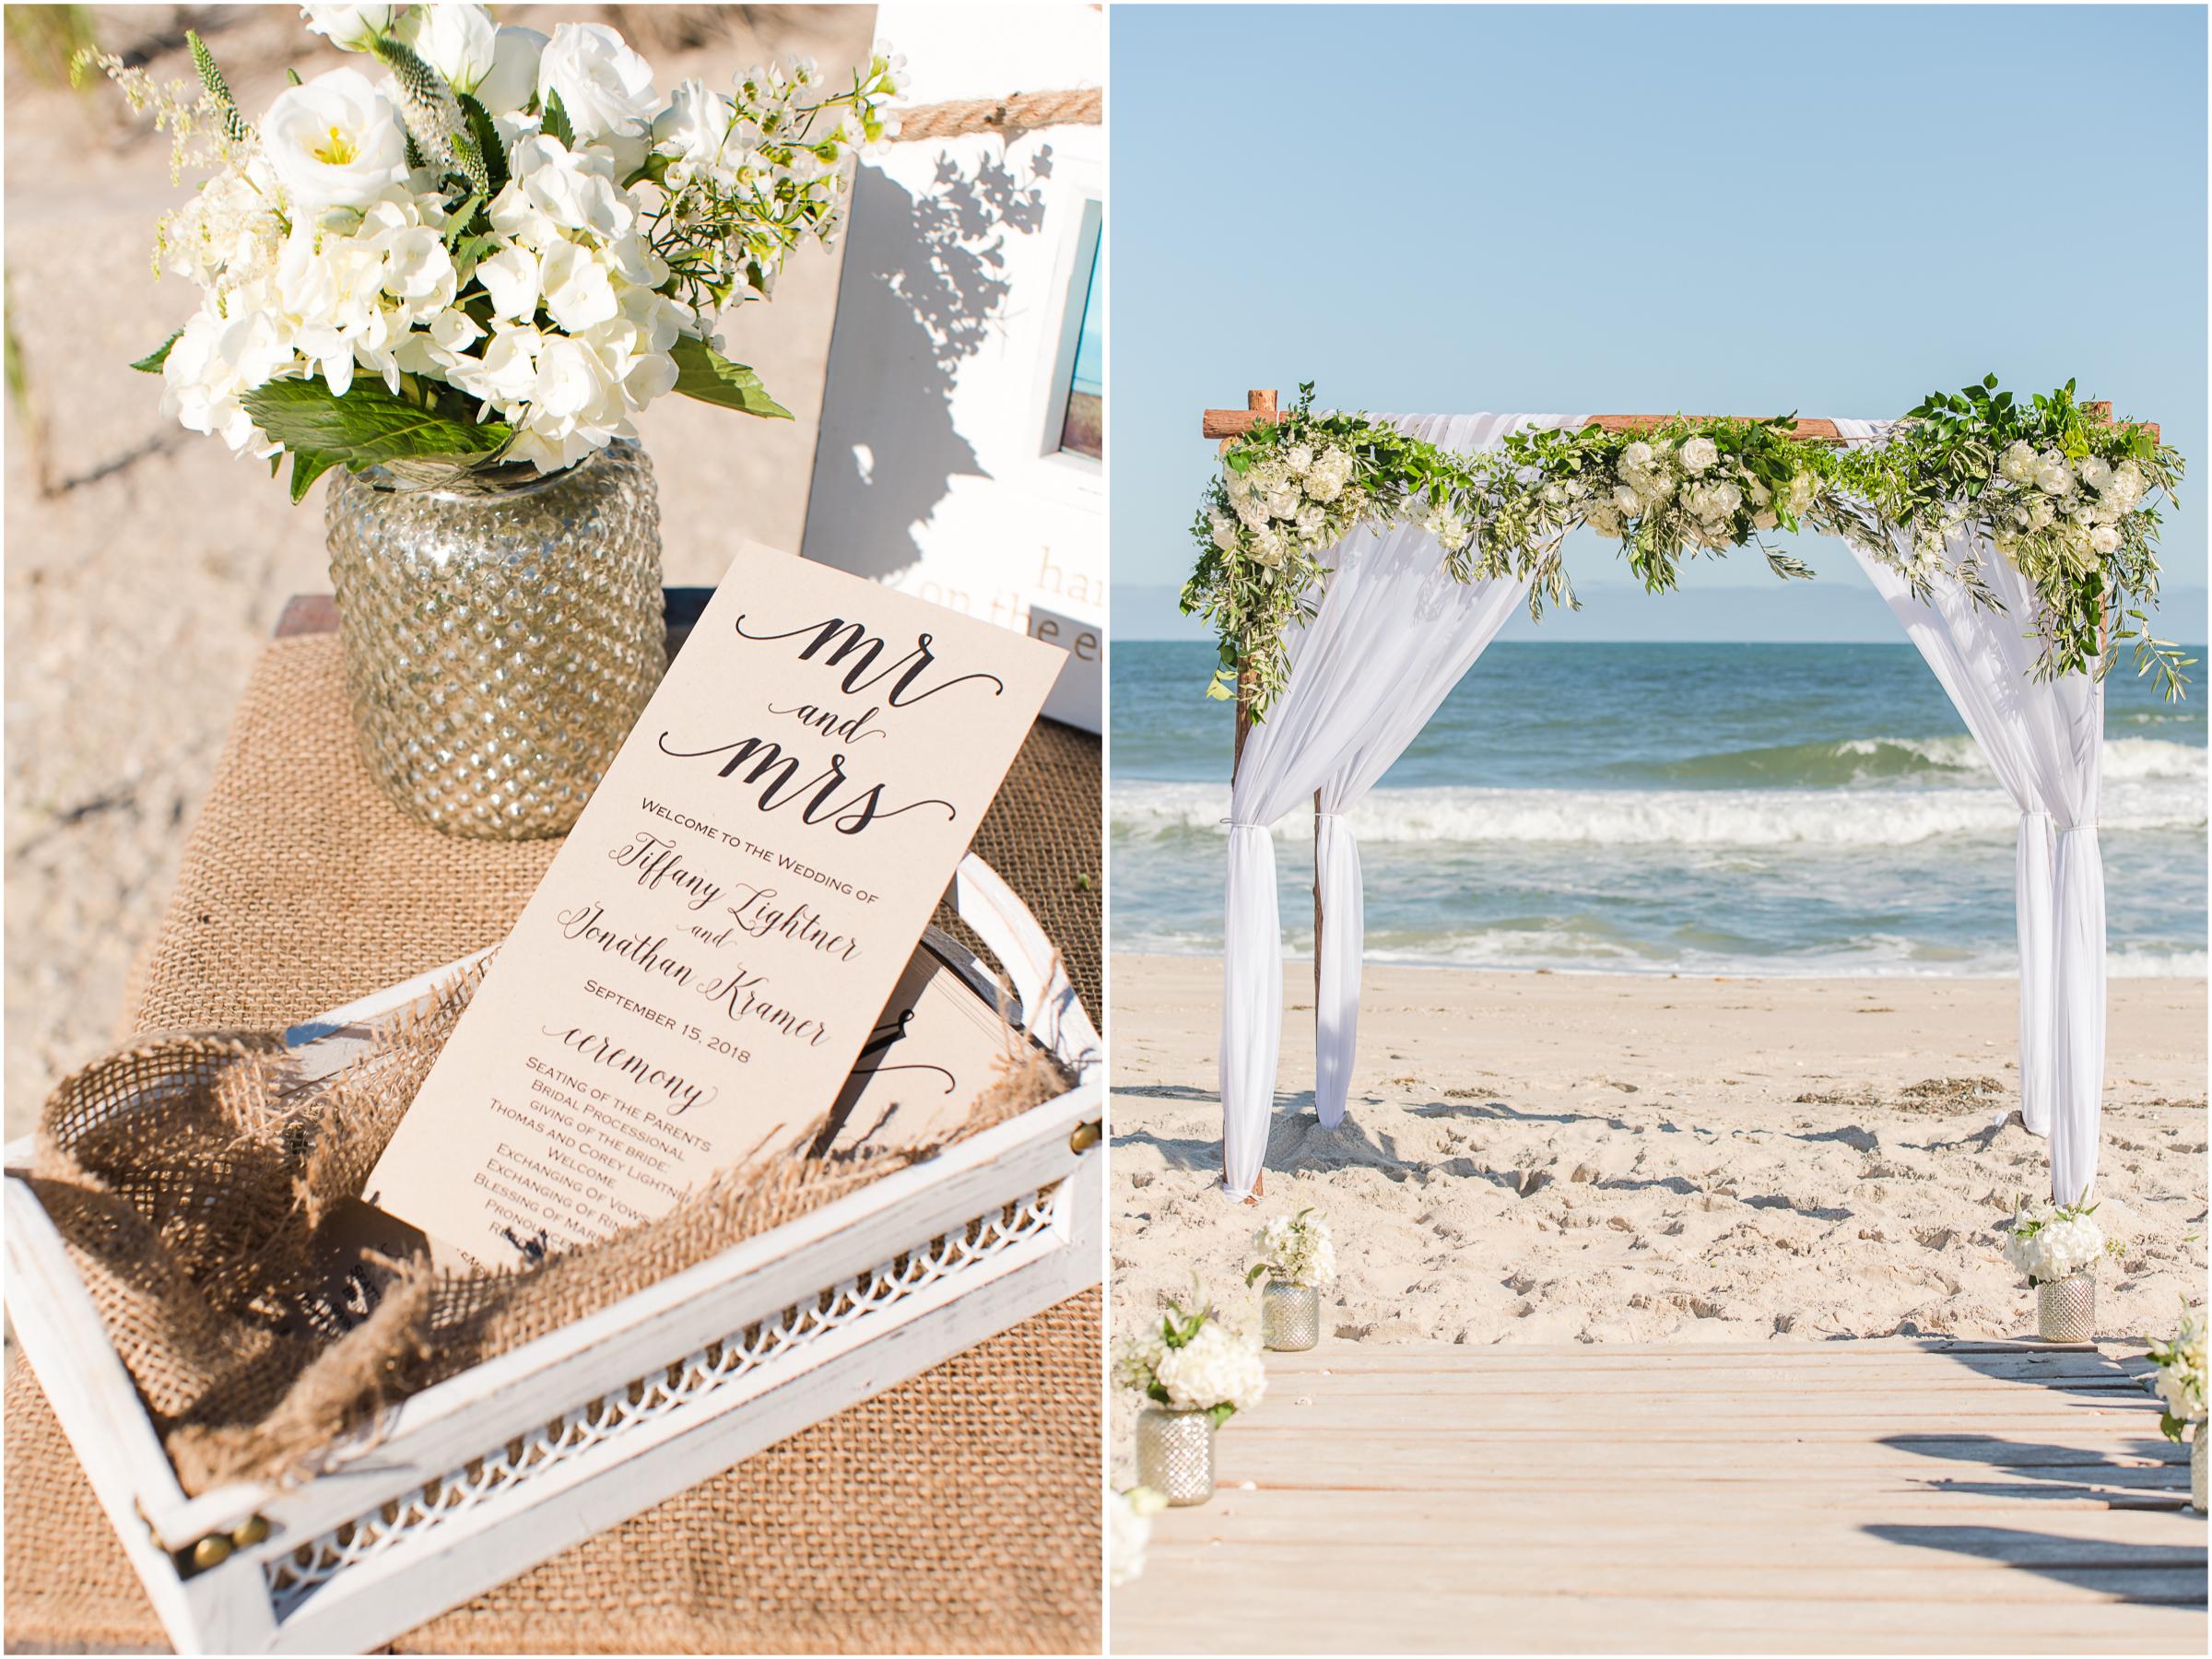 lbi-wedding-arts-foundation-lbi-wedding-photographer-12.jpg